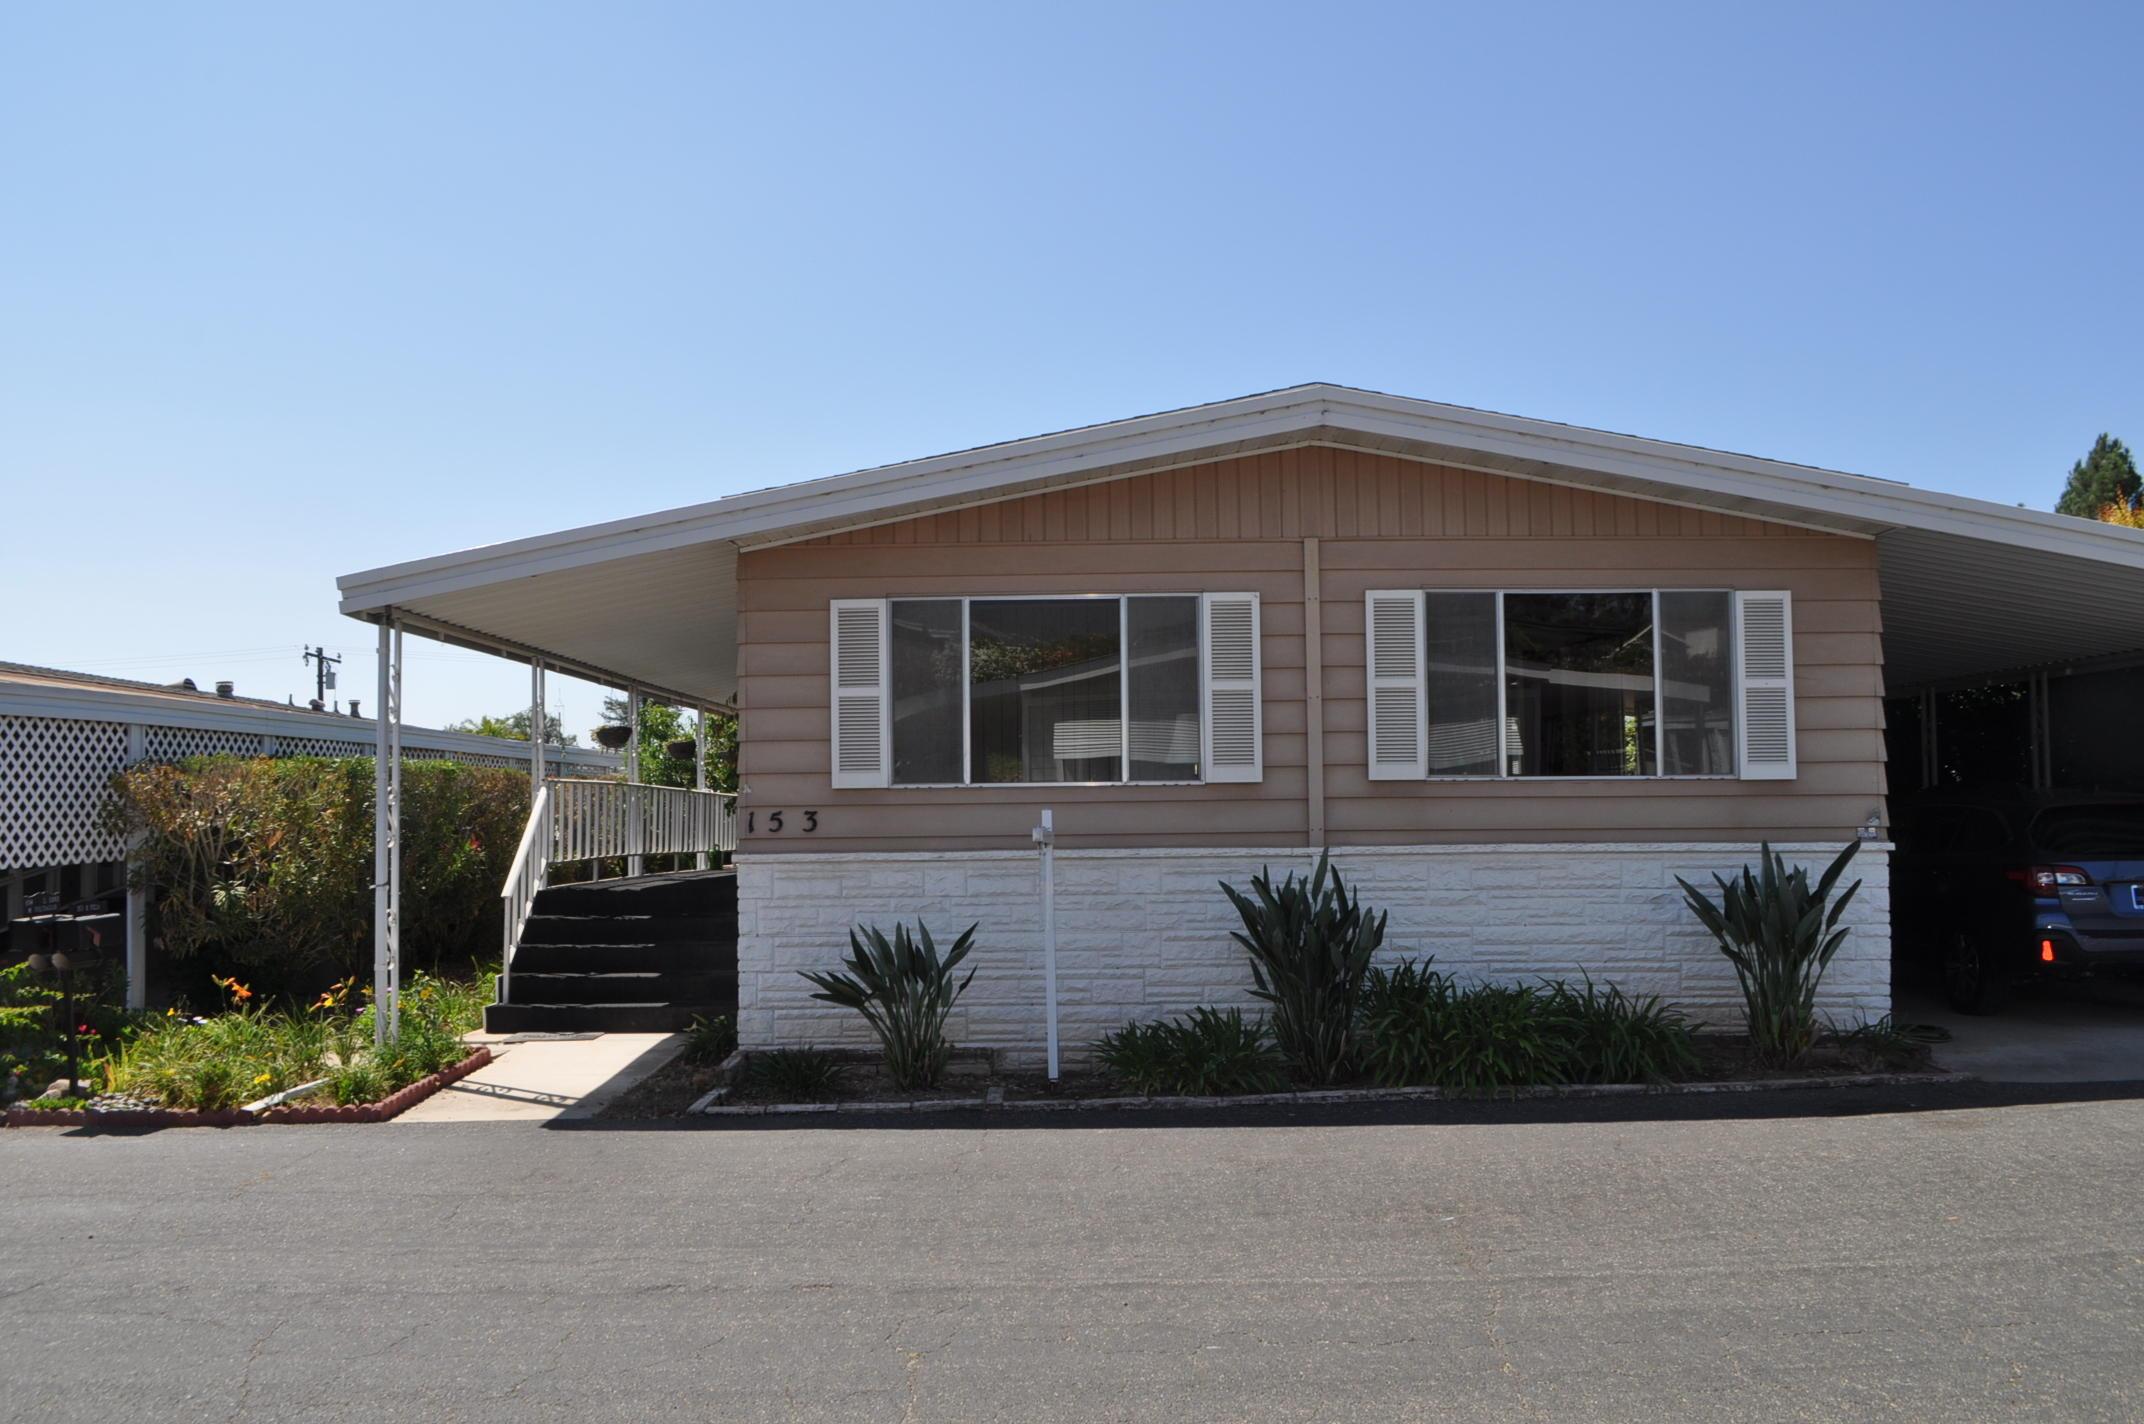 Property photo for 340 Old Mill Rd #153 Santa Barbara, California 93110 - 18-3029